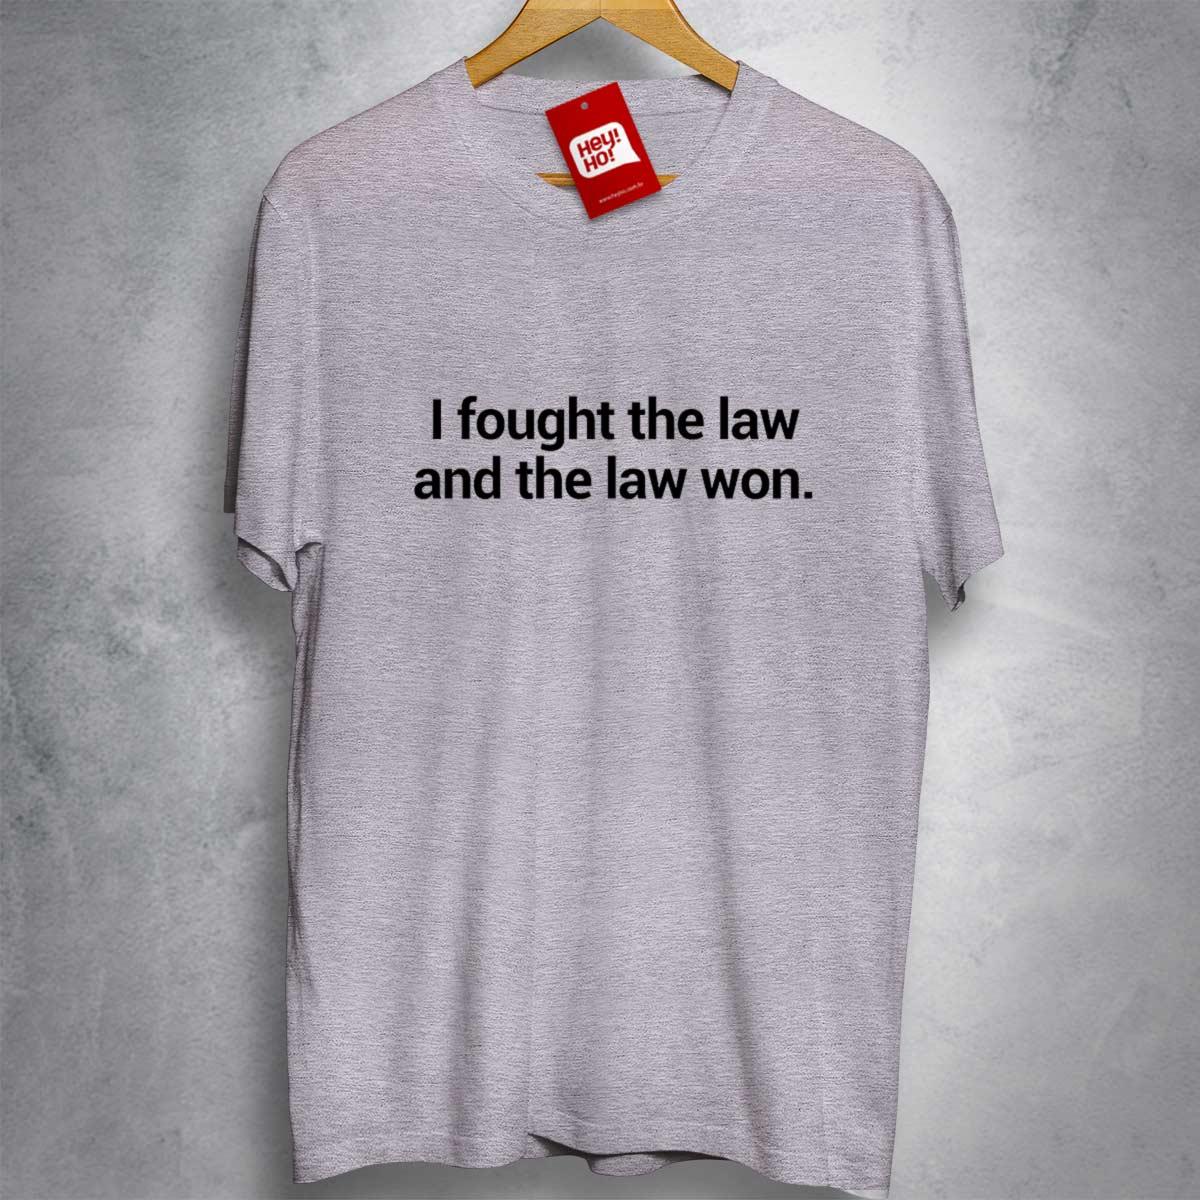 OFERTA - THE CLASH - I fought the law and the law won - CAMISETA MESCLA CLARA - Tamanho M